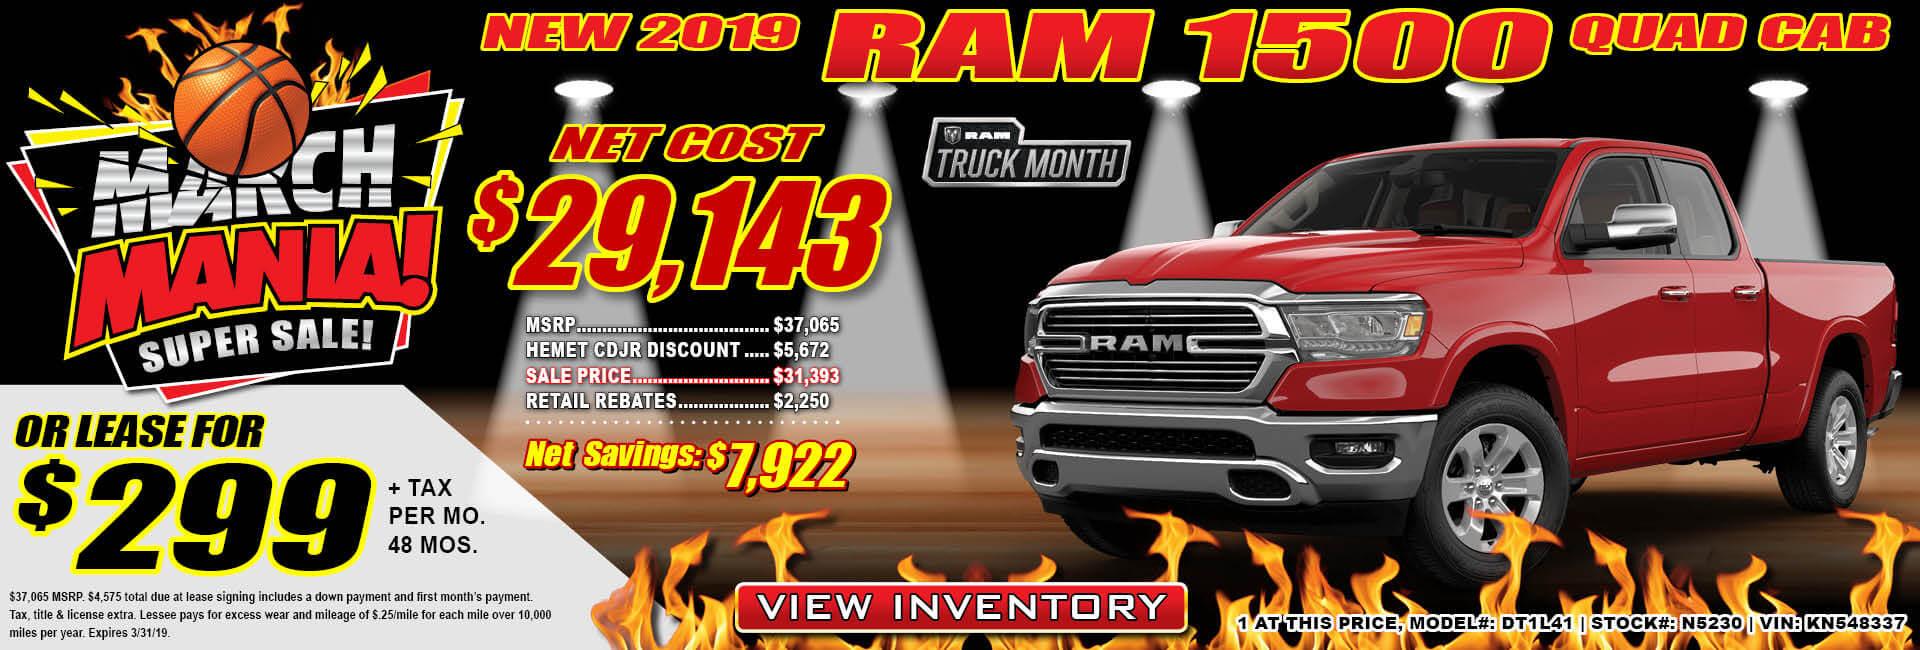 Ram 1500 Lease $299